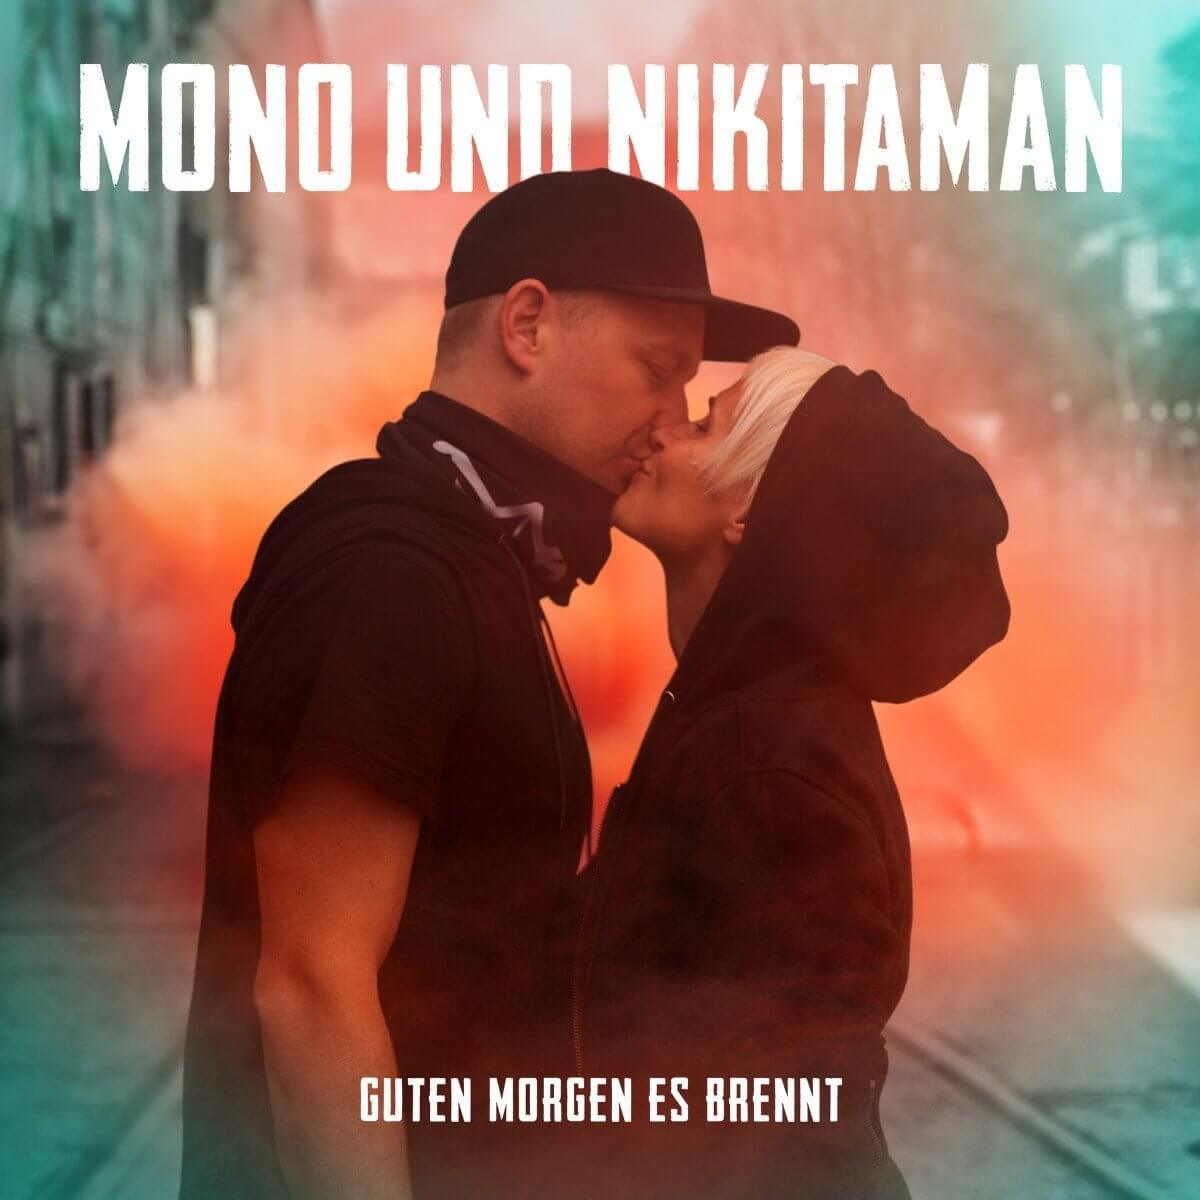 Mono und Nikitaman – Neues Album kommt